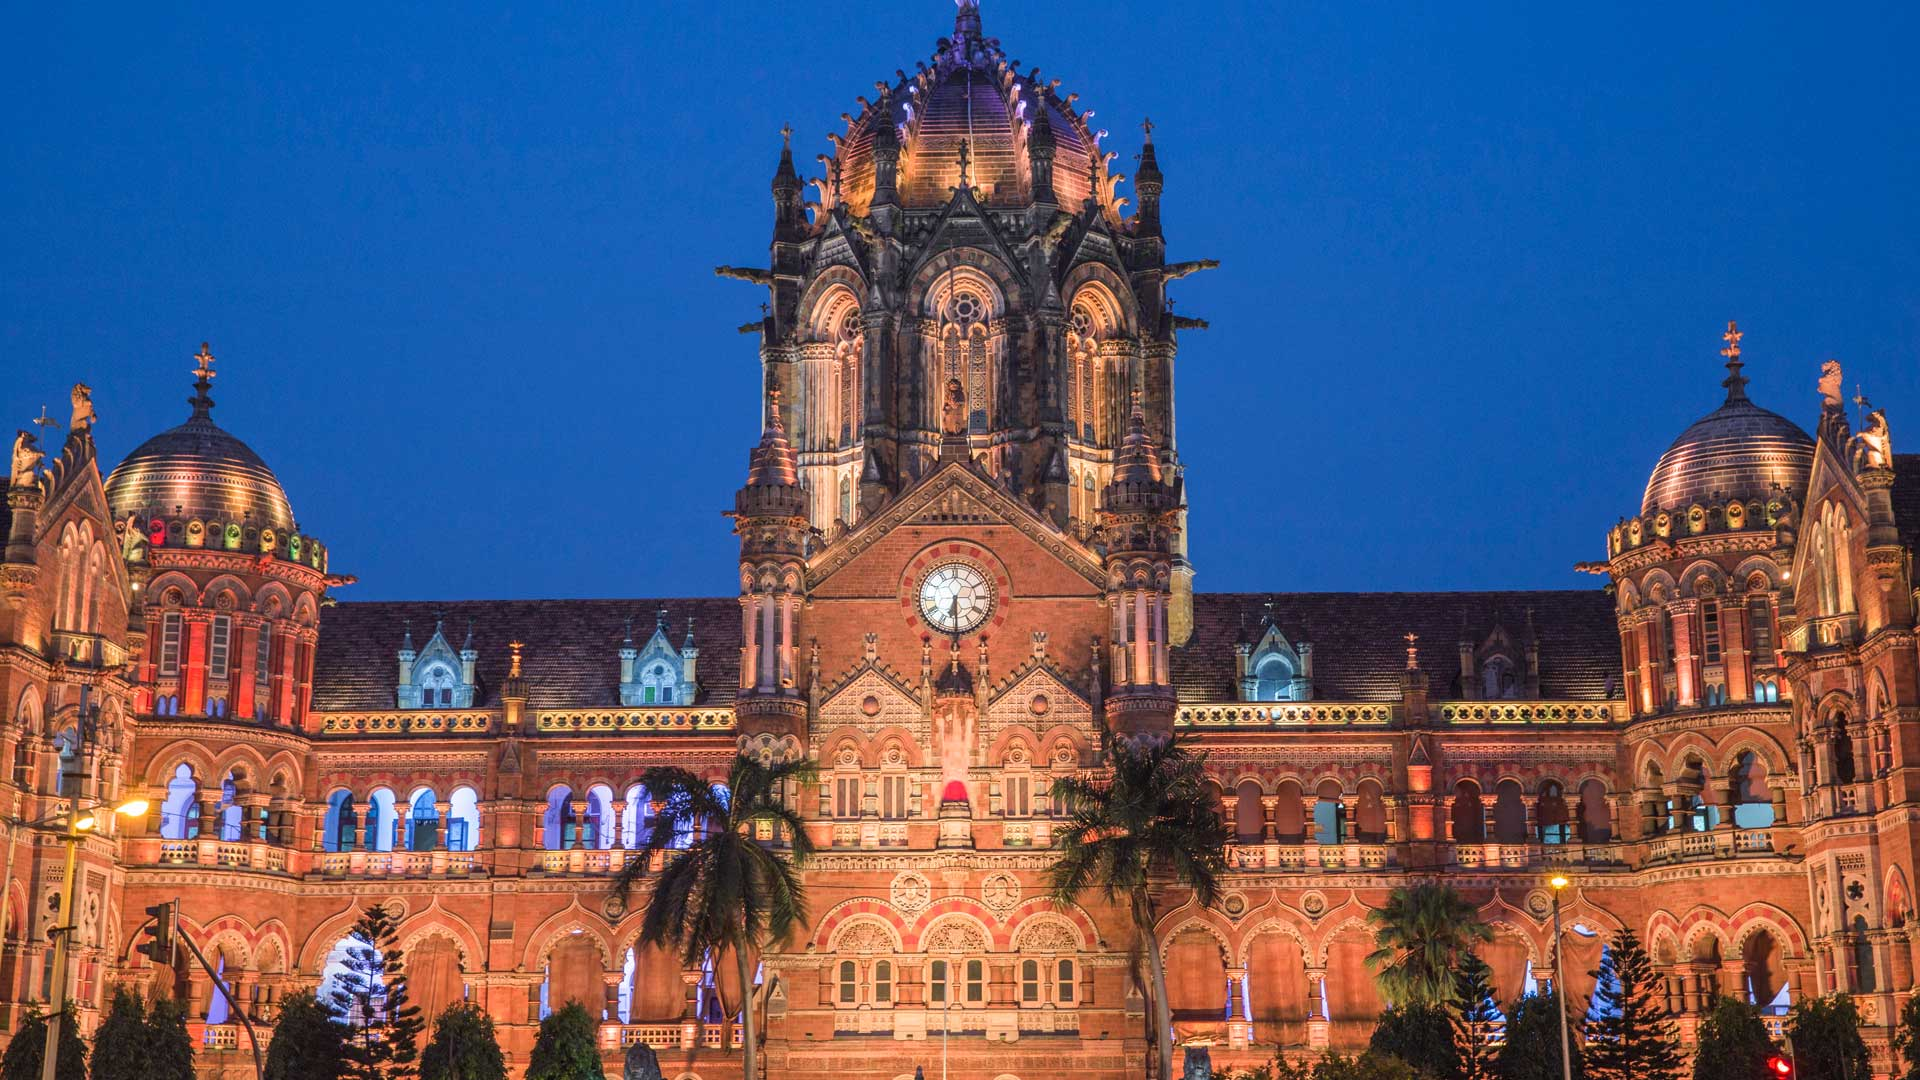 Chhatrapati Shivaji Terminus, a UNESCO-listed historic railway station in Mumbai, India with GeoEx